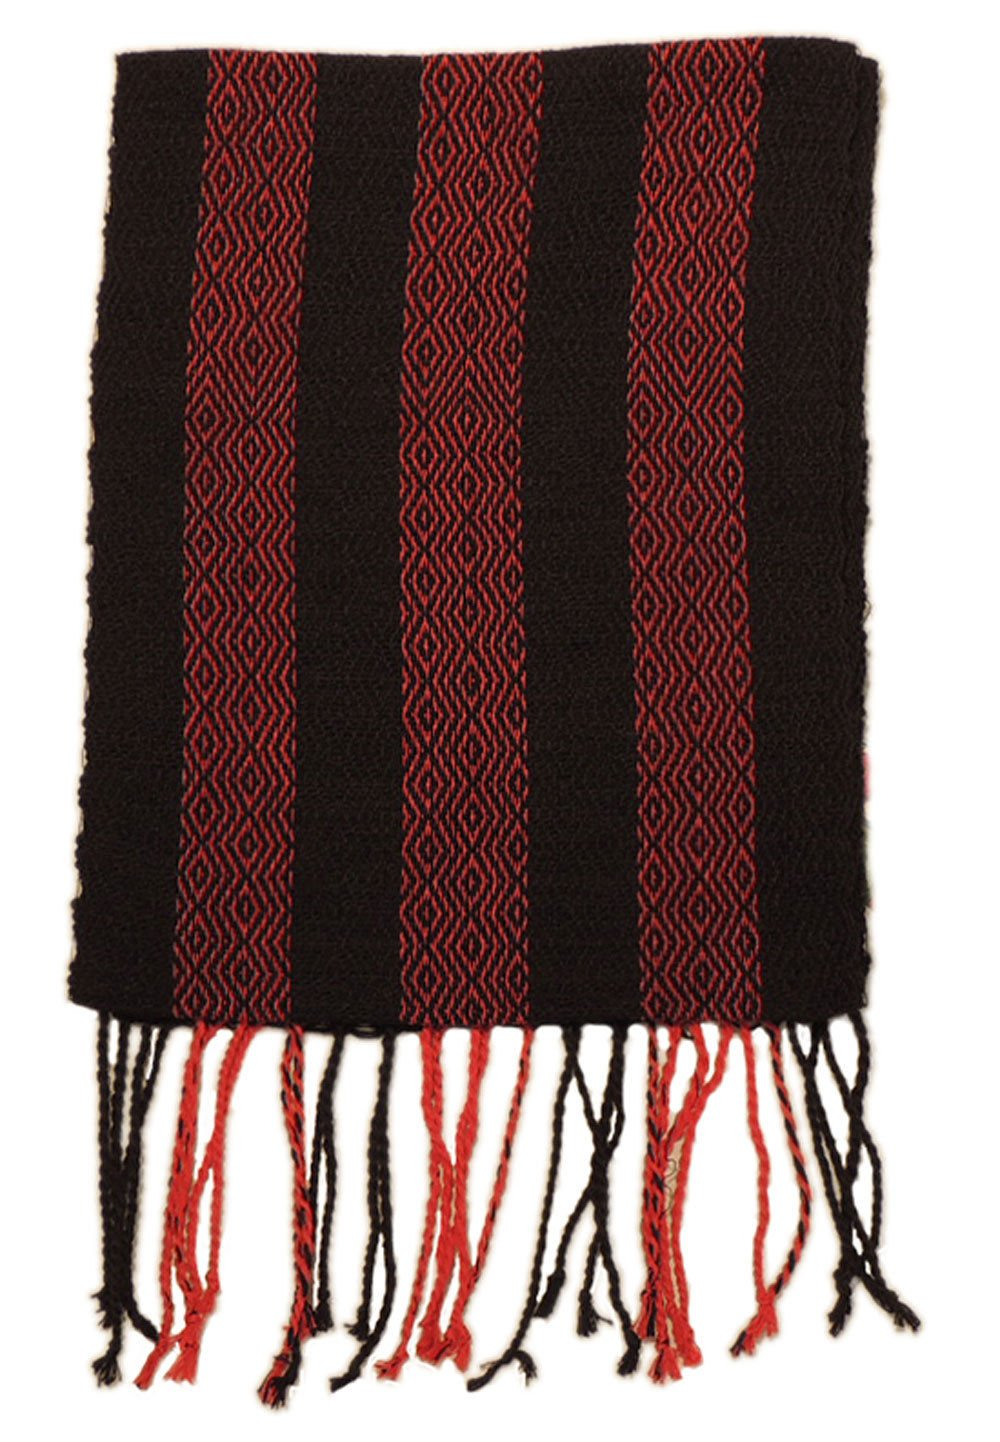 #4417 Hand Loomed Striped Alpaca Scarf Two Pack Assortment Artisan Peru Designer